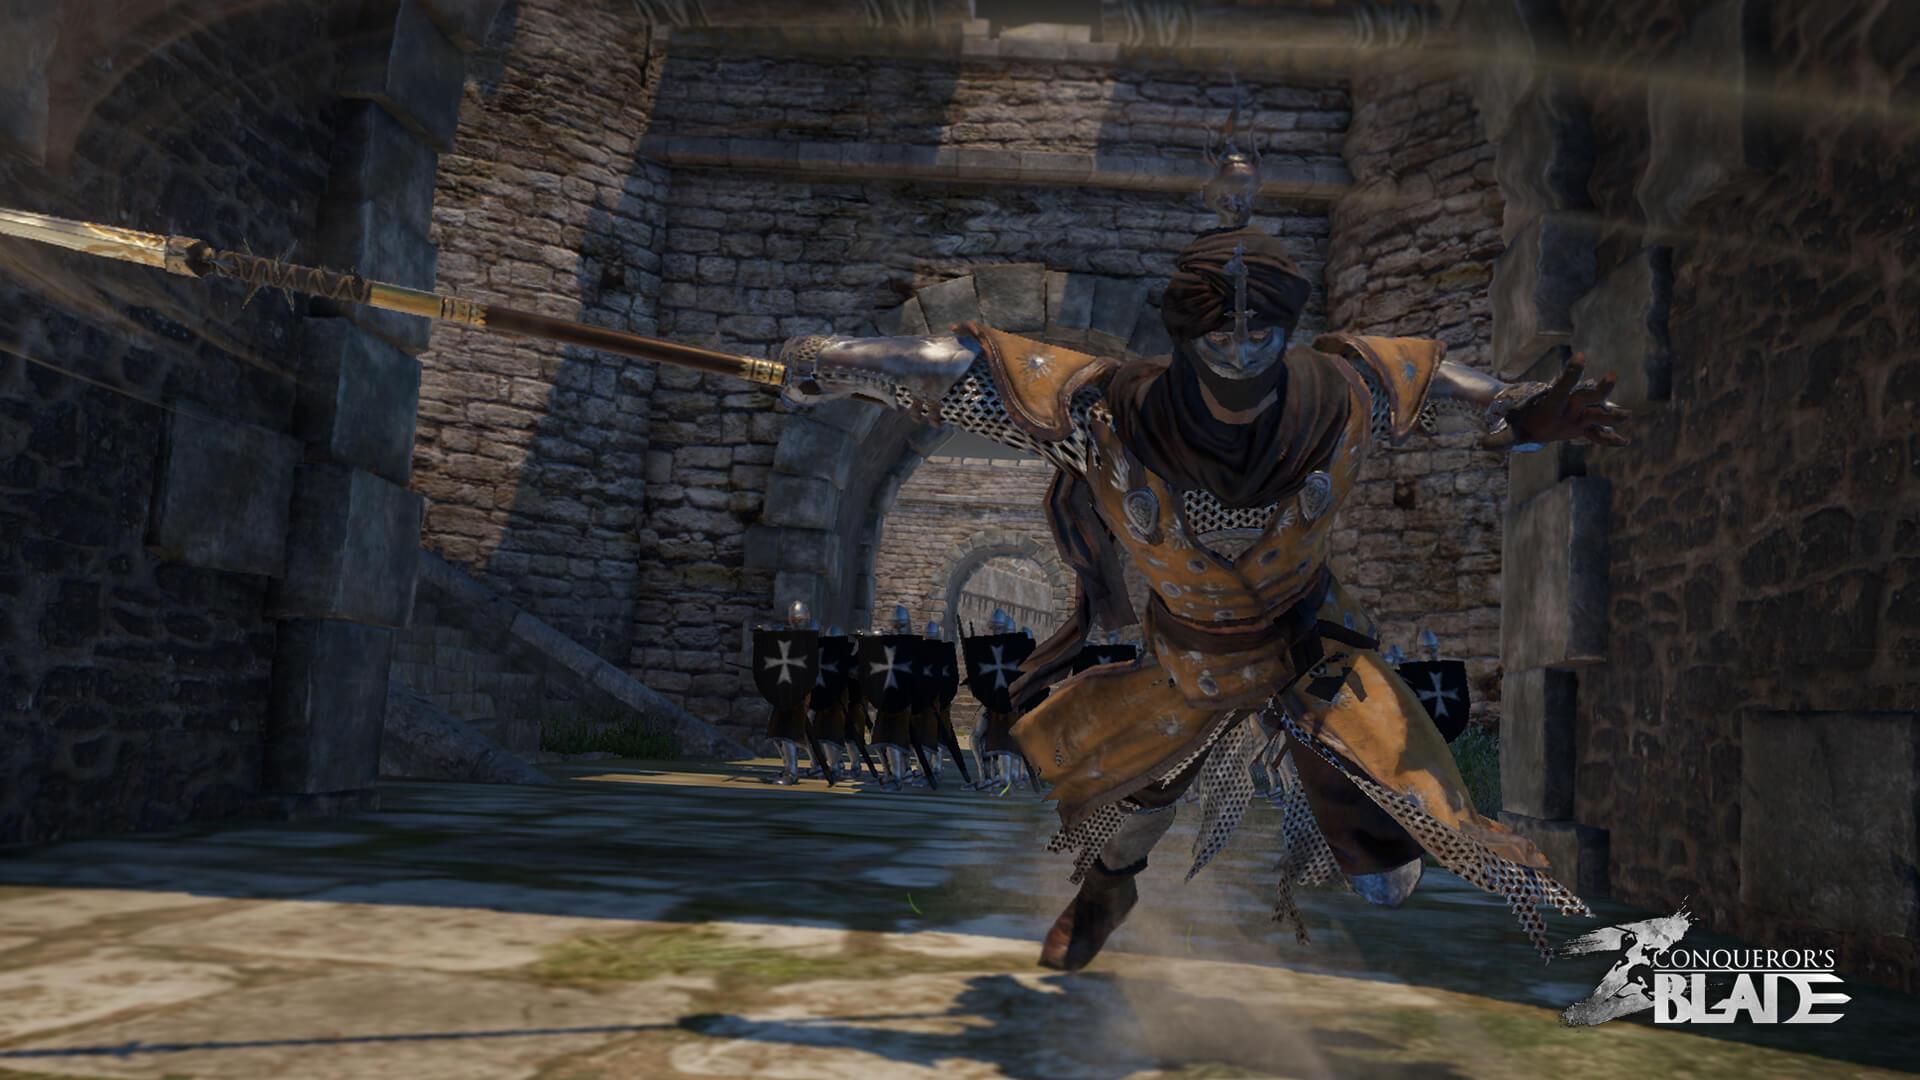 Conqueror's Blade Screenshot 7